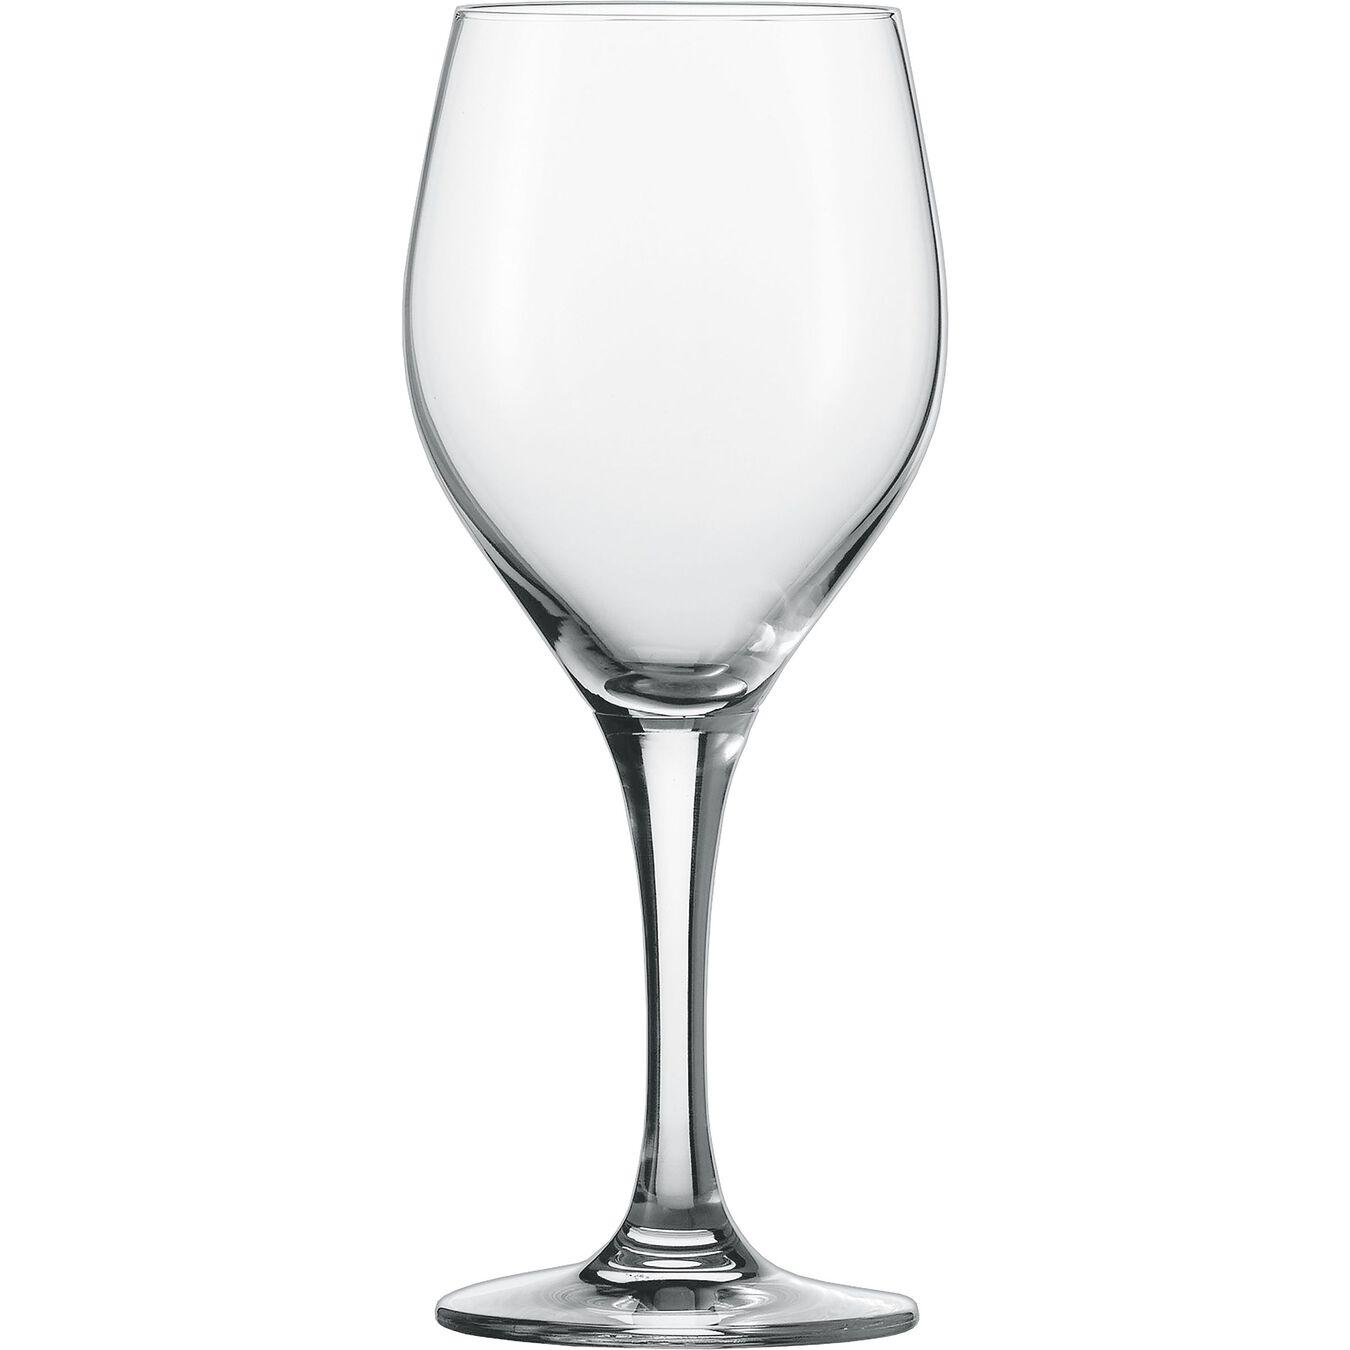 Taça para vinho tinto bordeaux 330 ml 330 ml,,large 1